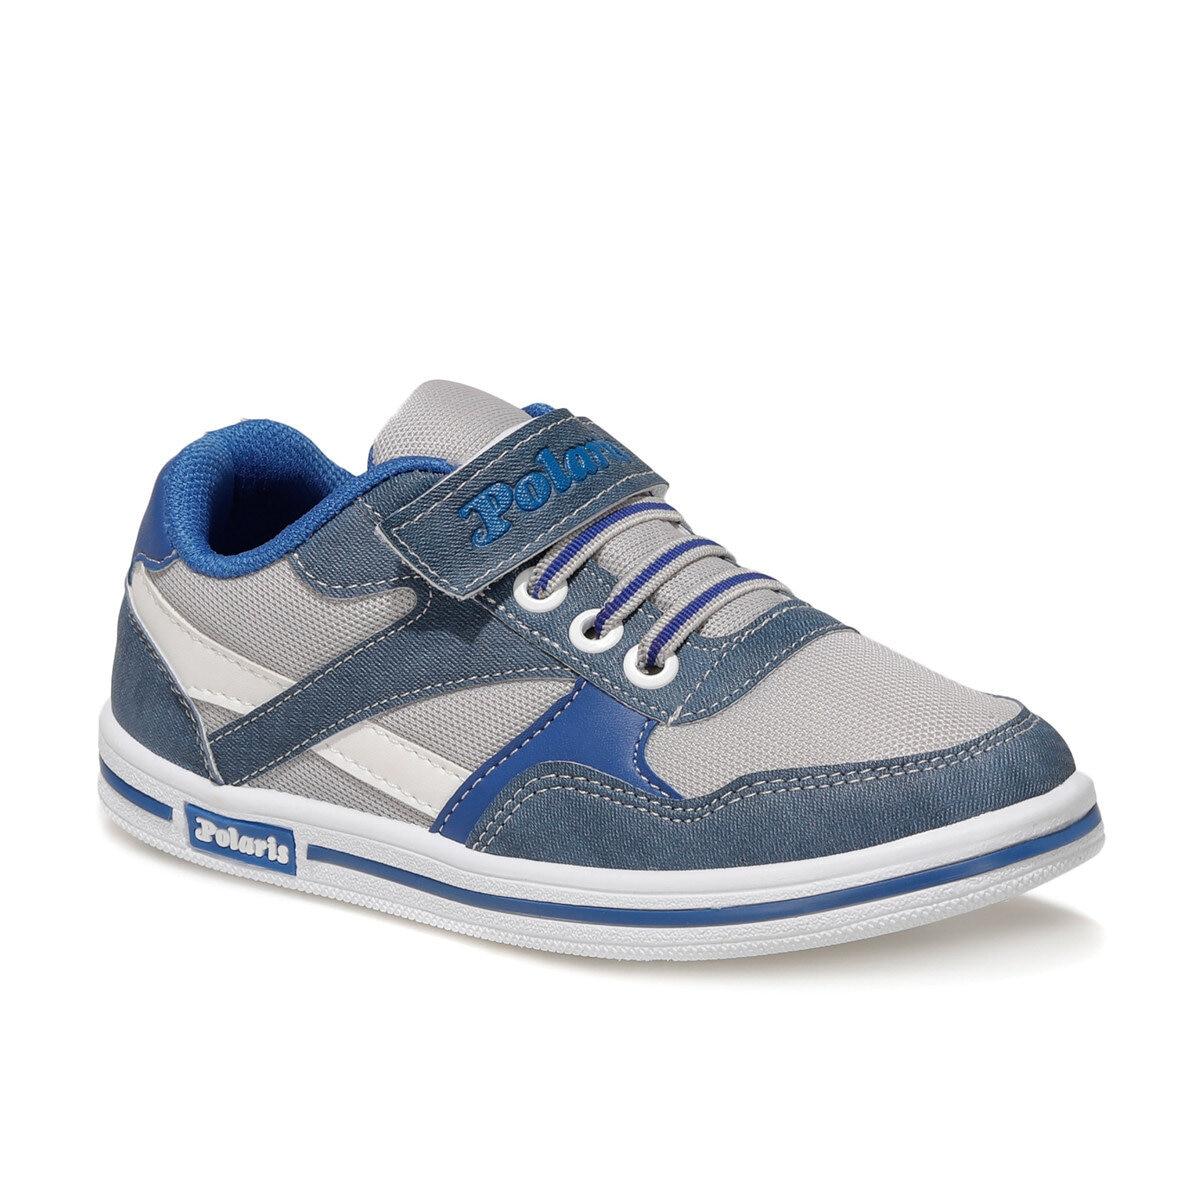 510880.F1FX حذاء رياضي رجالي أزرق